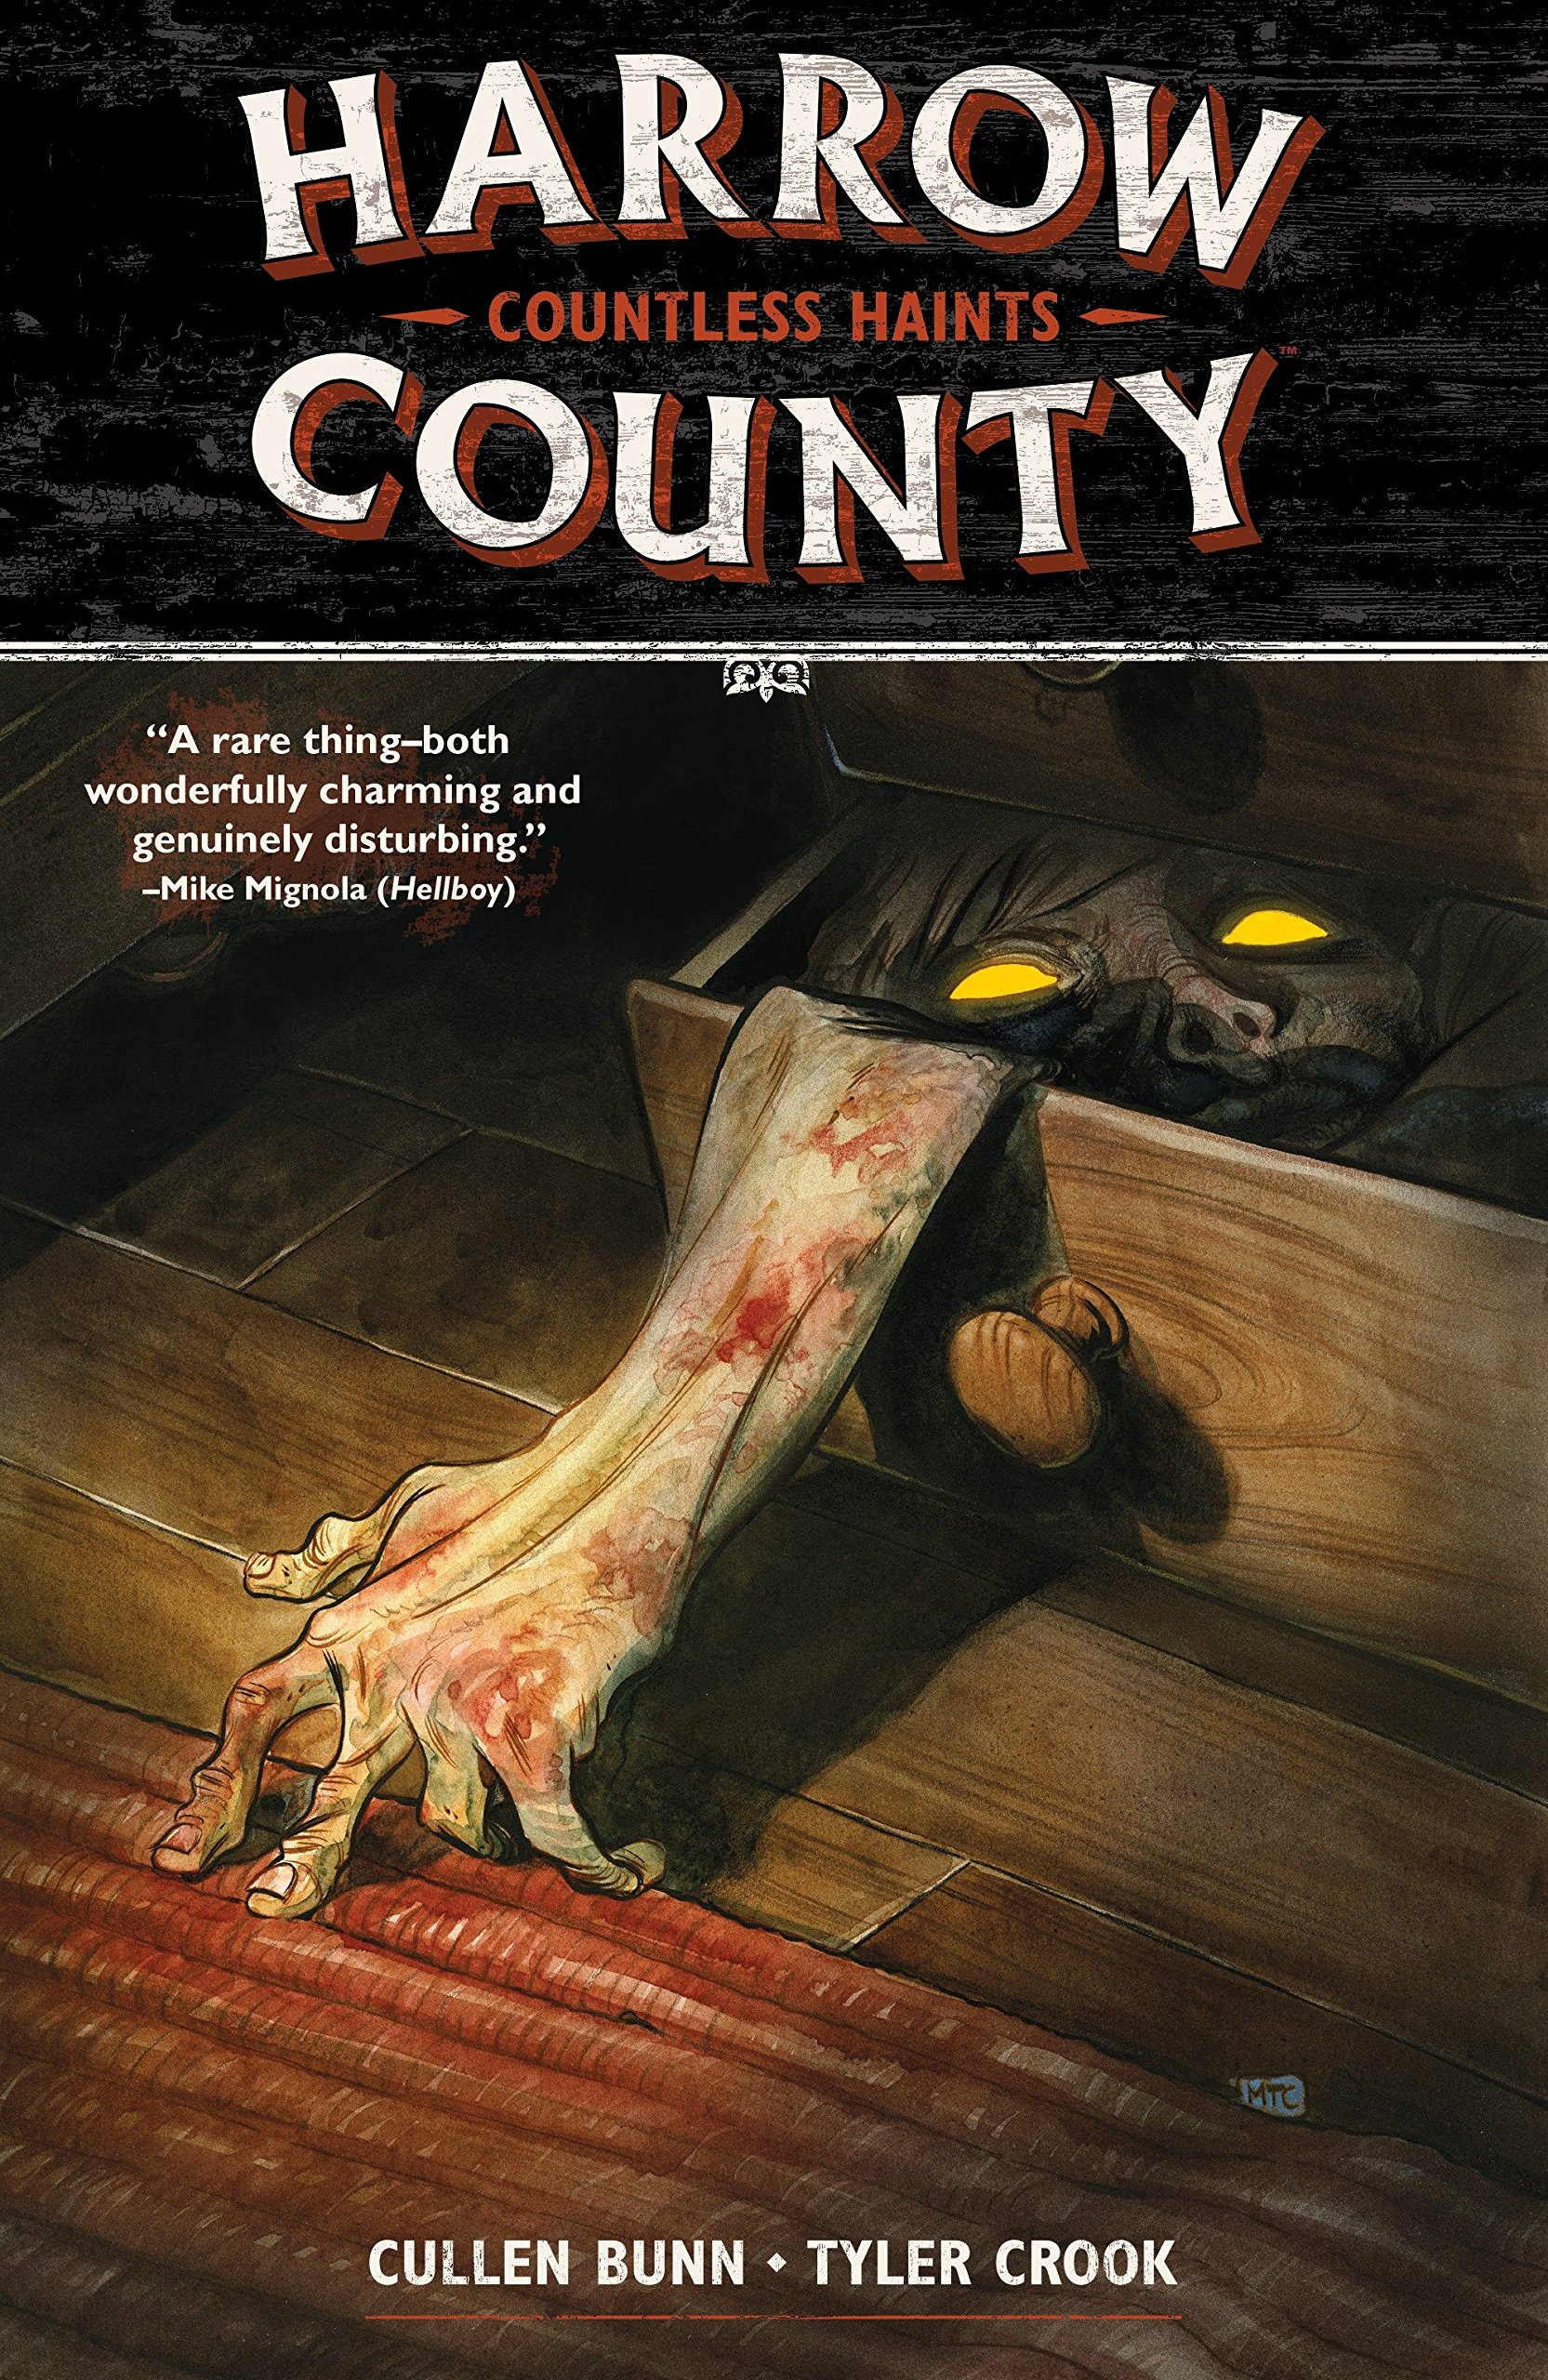 Harrow County: Volume 1: Countless Haints - Used